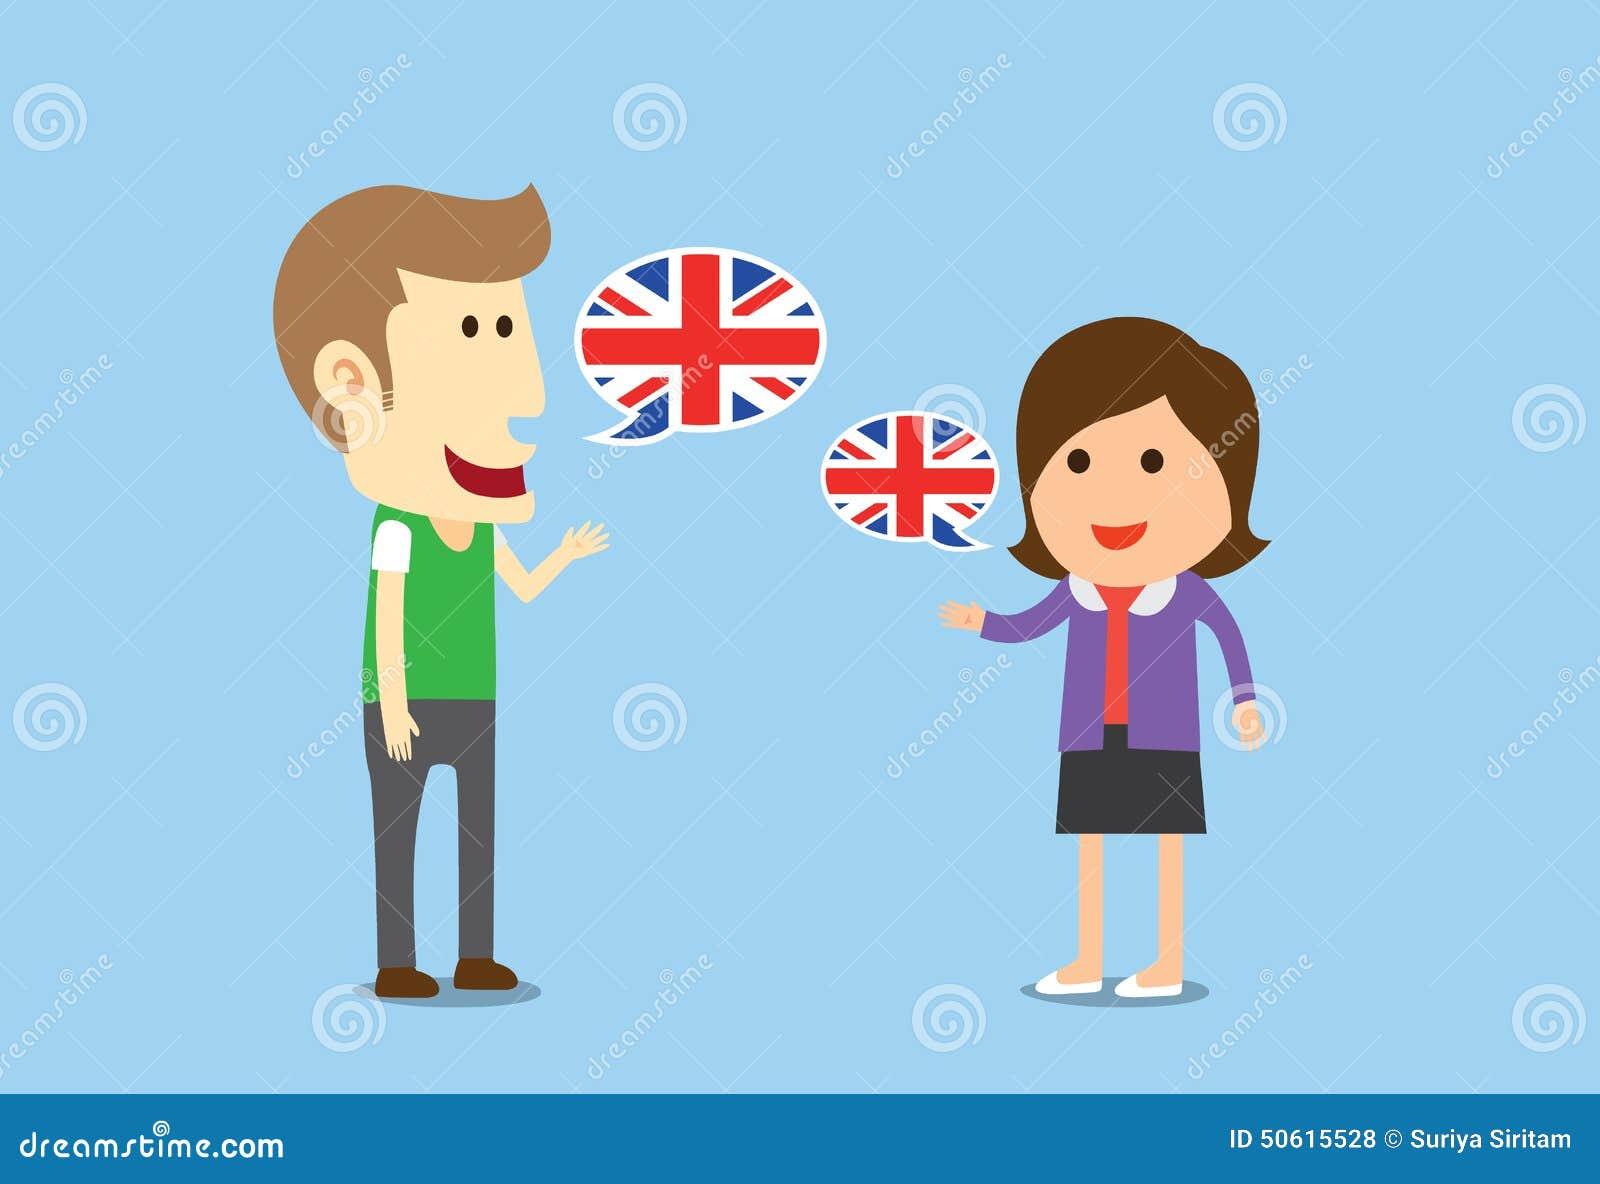 Speaking English Speaking Russian Woman 75